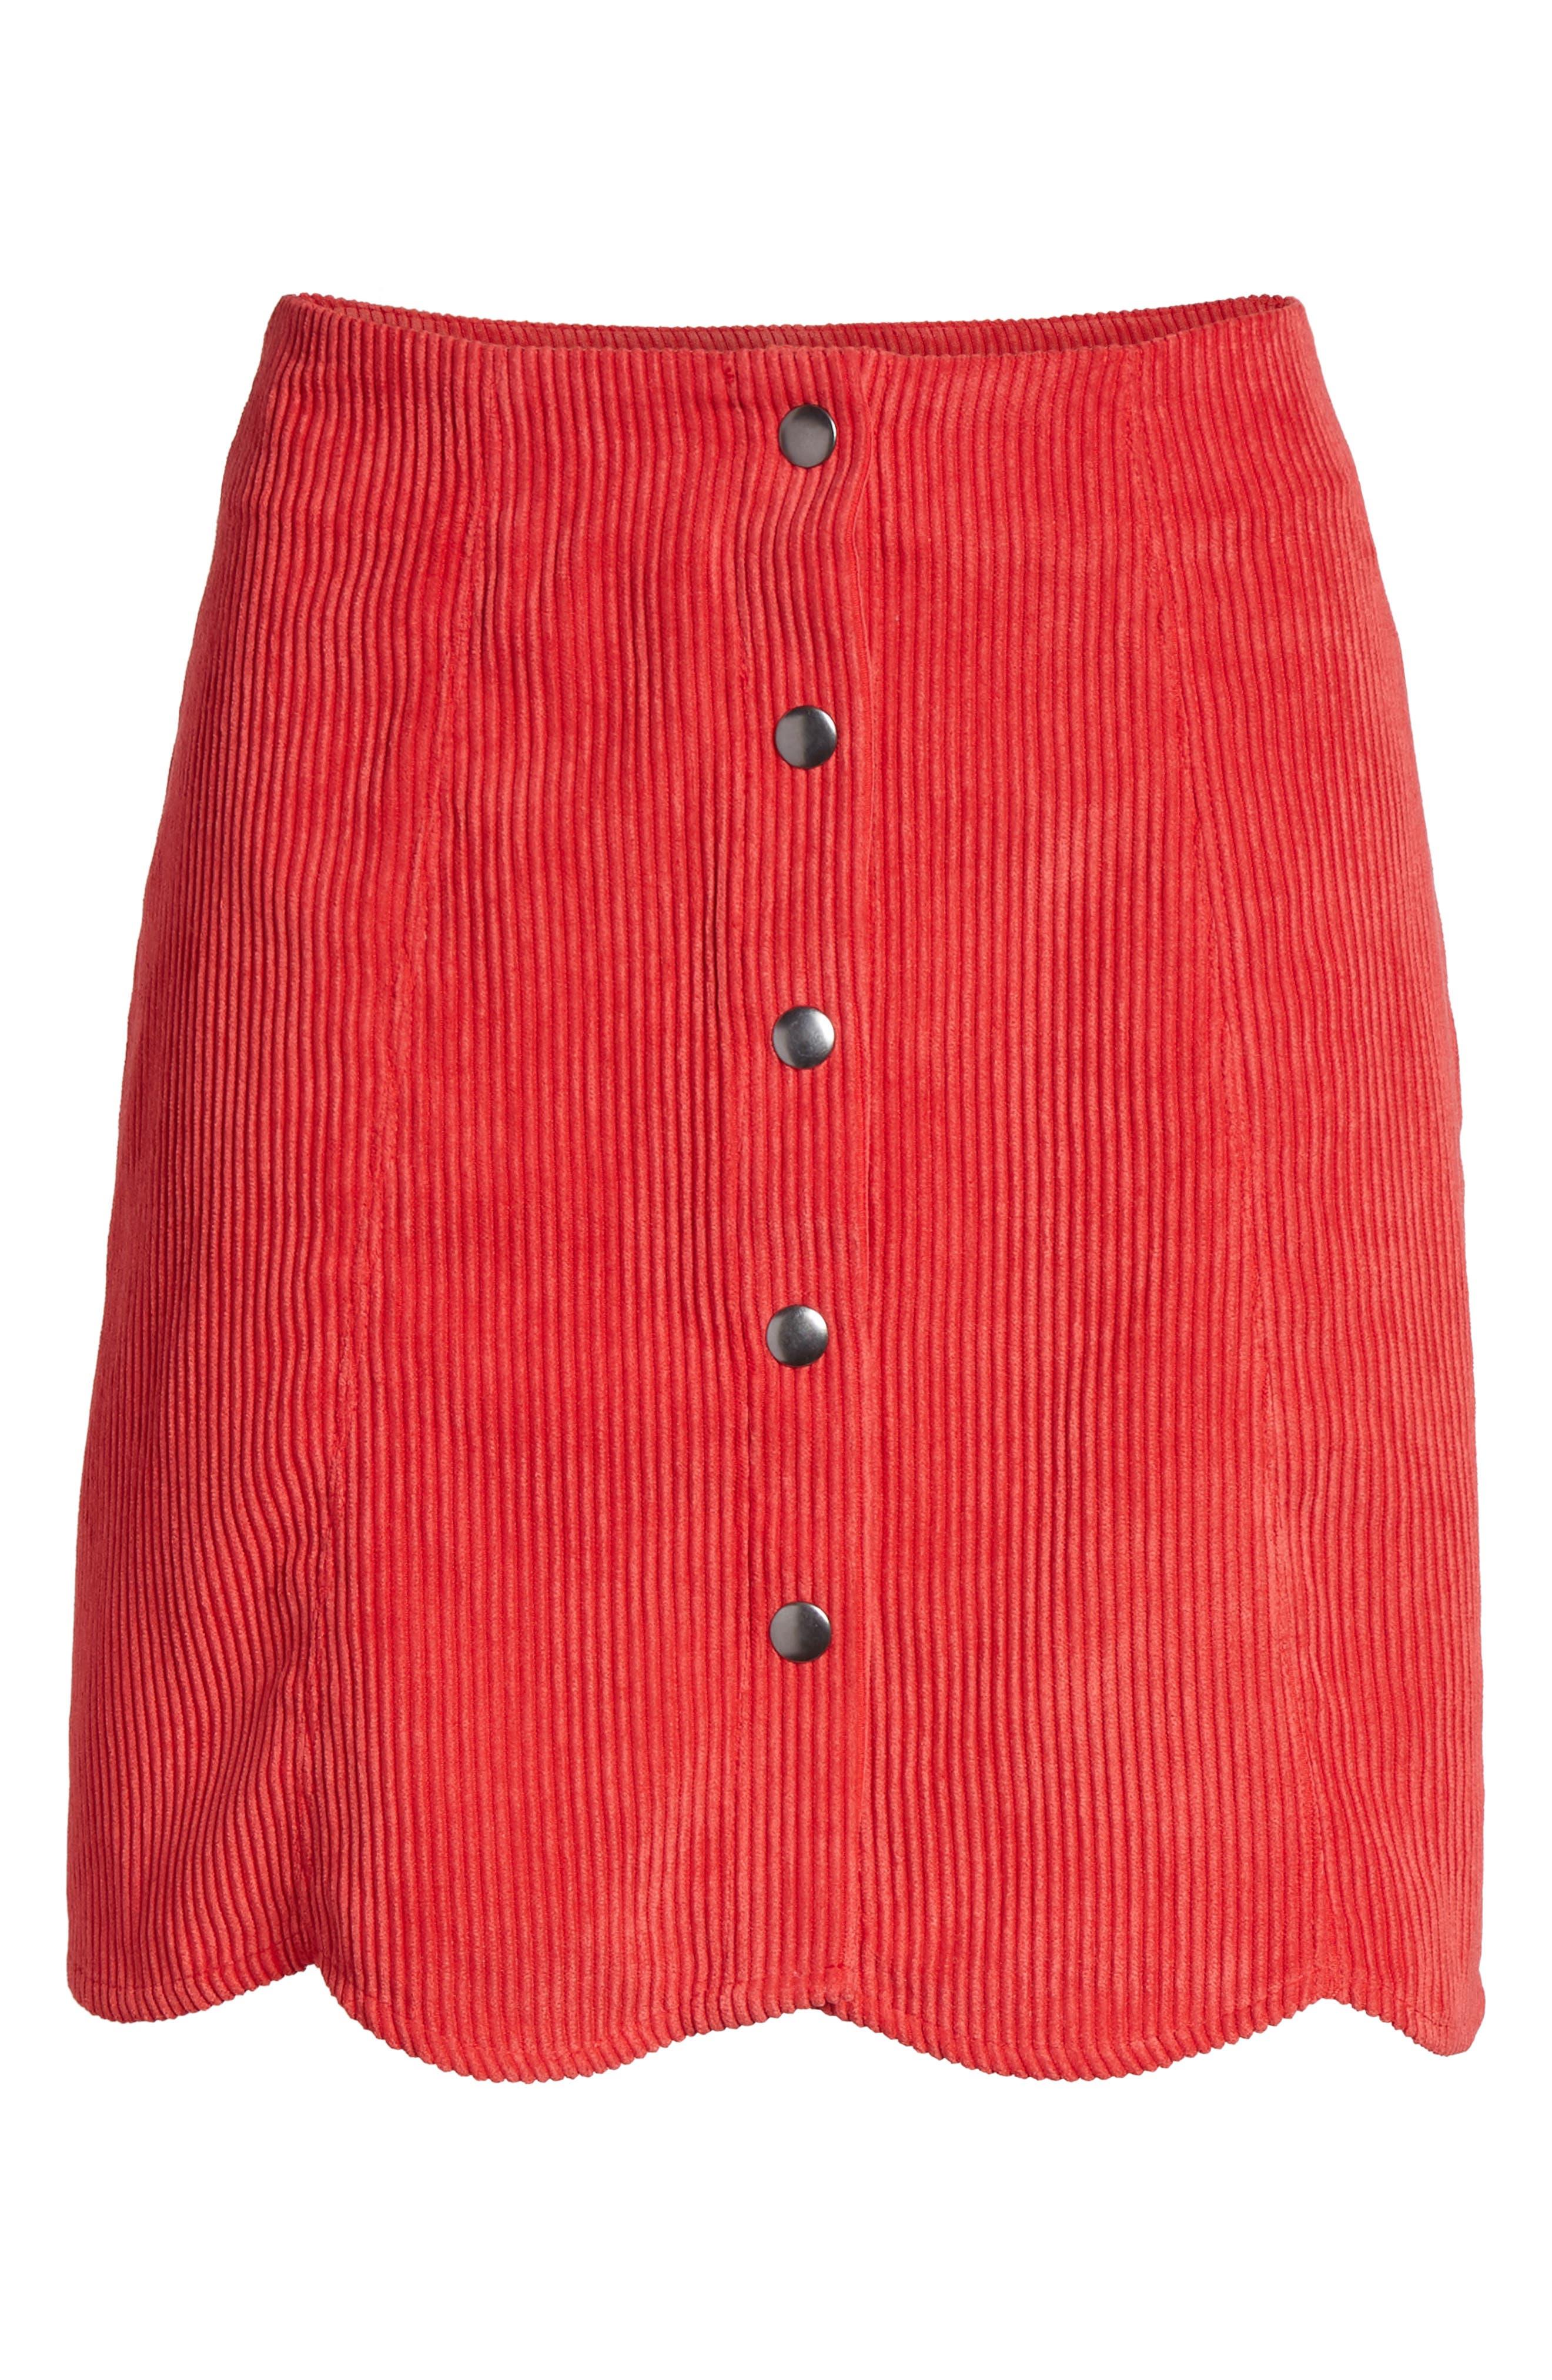 Central Corduroy Scallop Hem Skirt,                             Alternate thumbnail 6, color,                             621